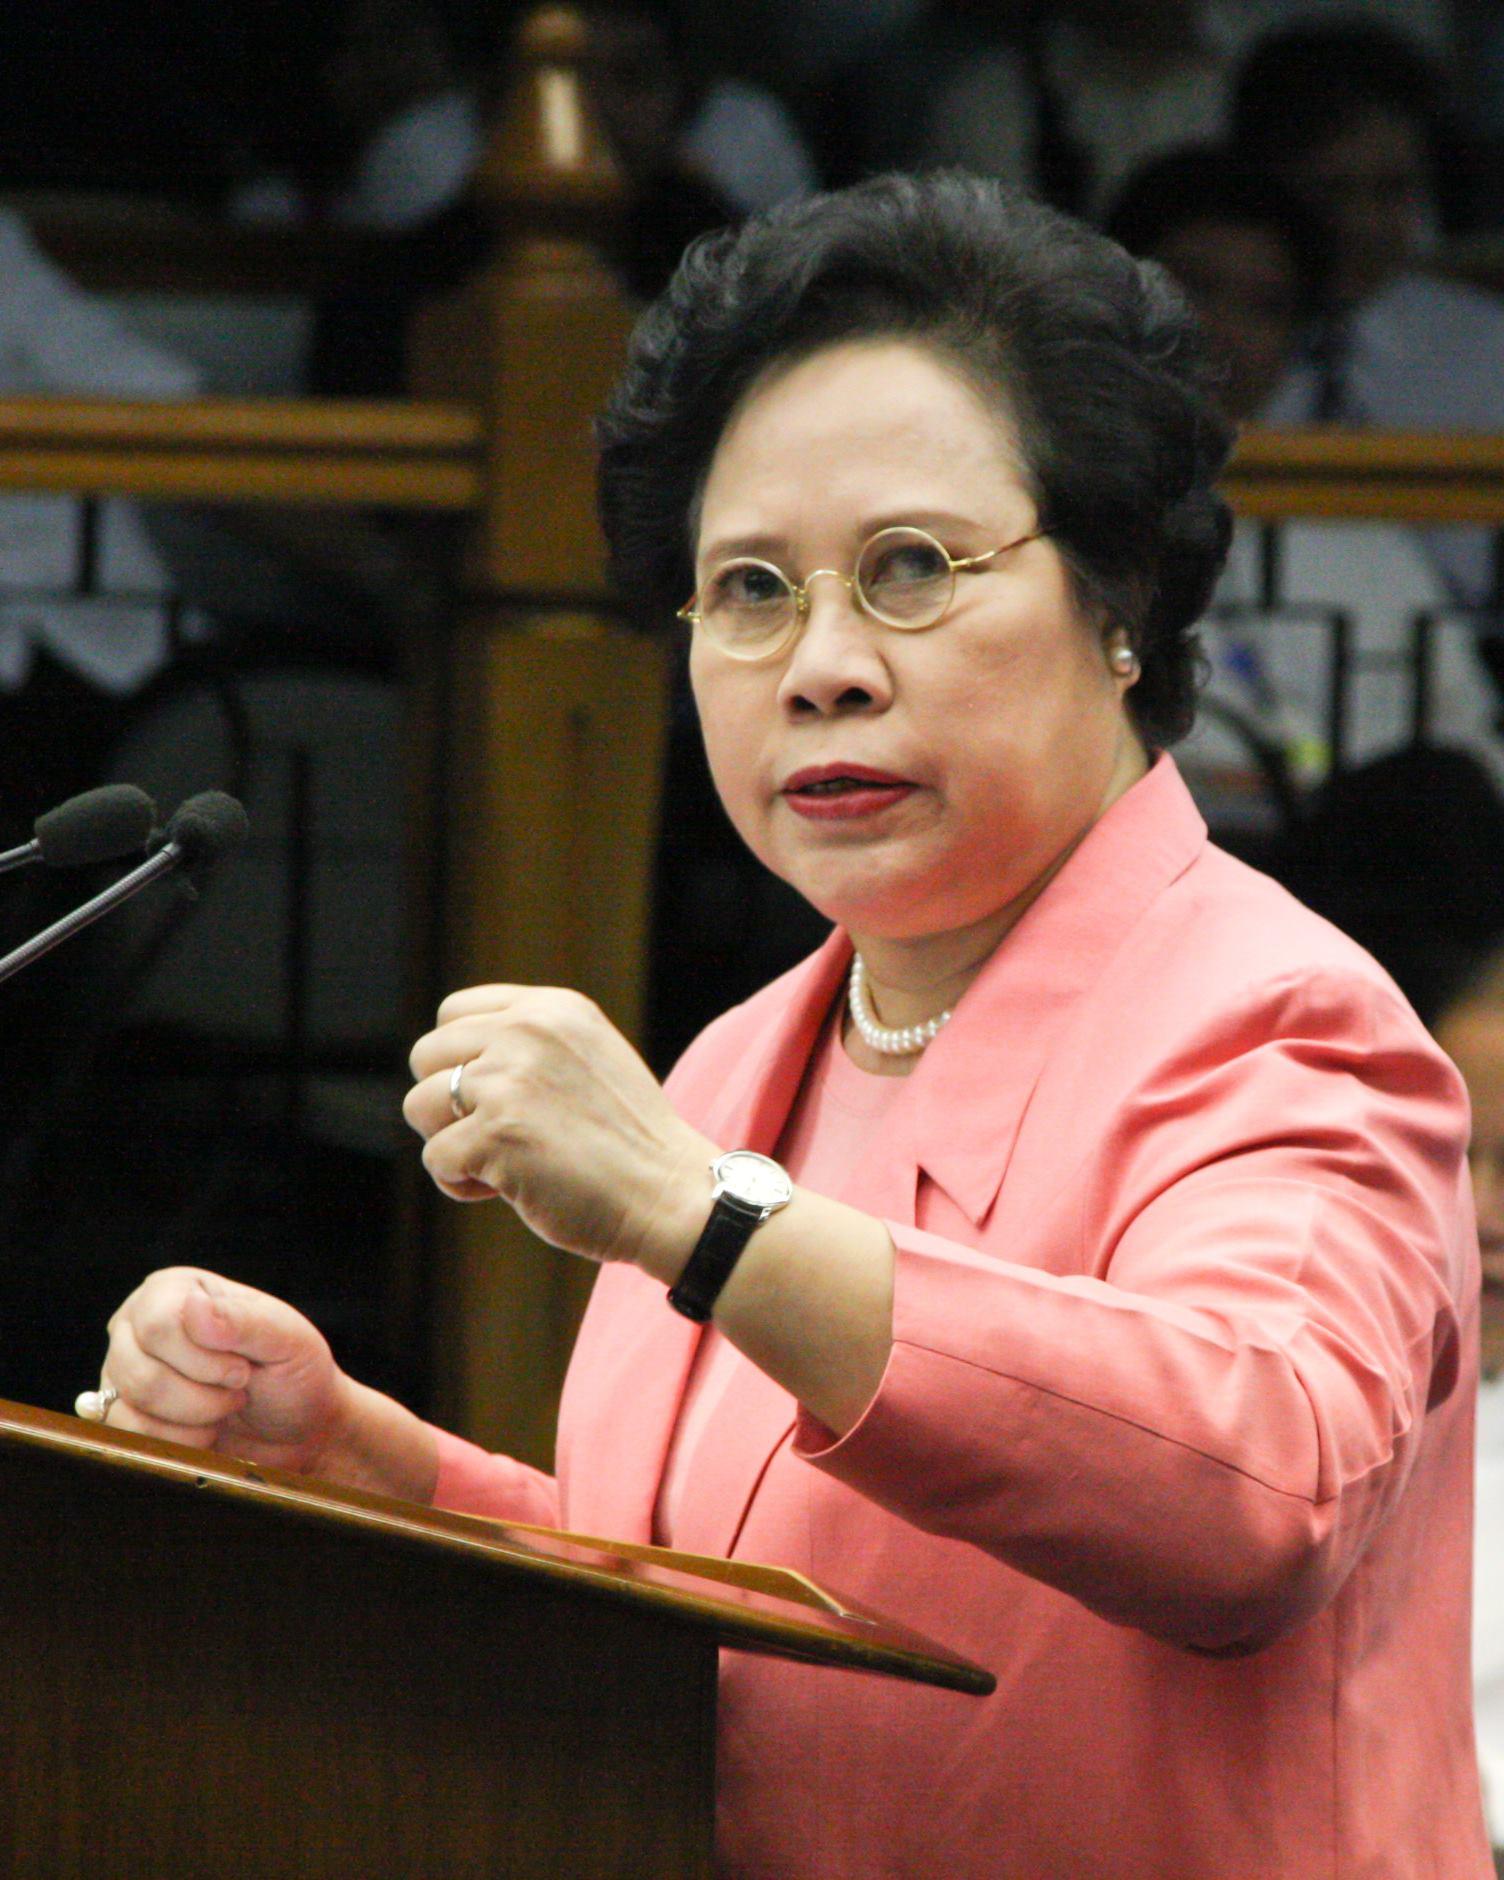 Miriam Santiago: I have lung cancer